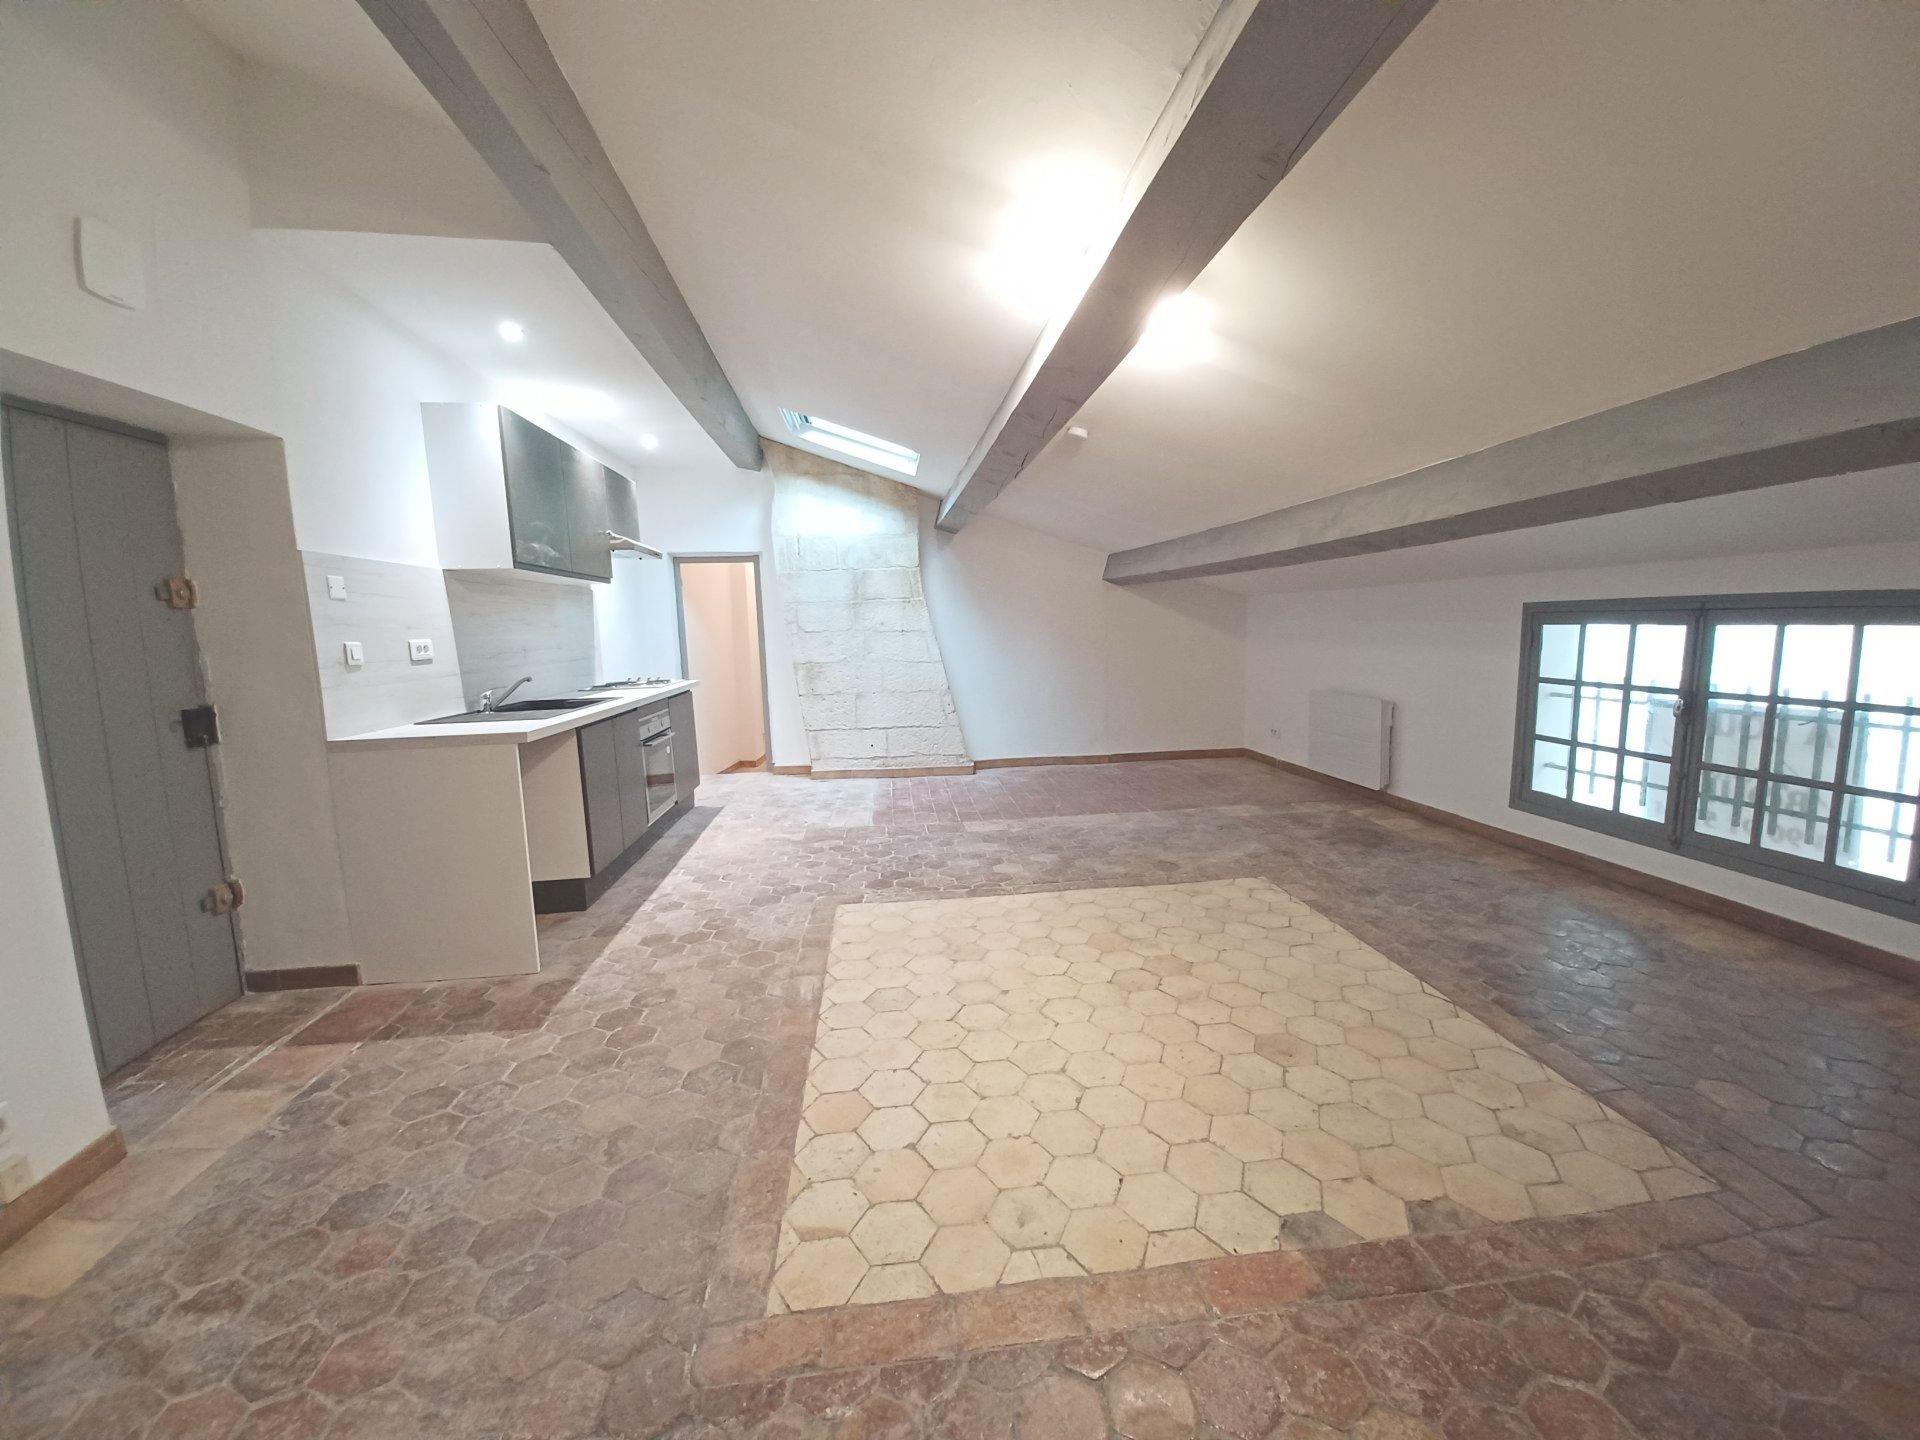 Location Appartement BEAUCAIRE Mandat : 1014-0011